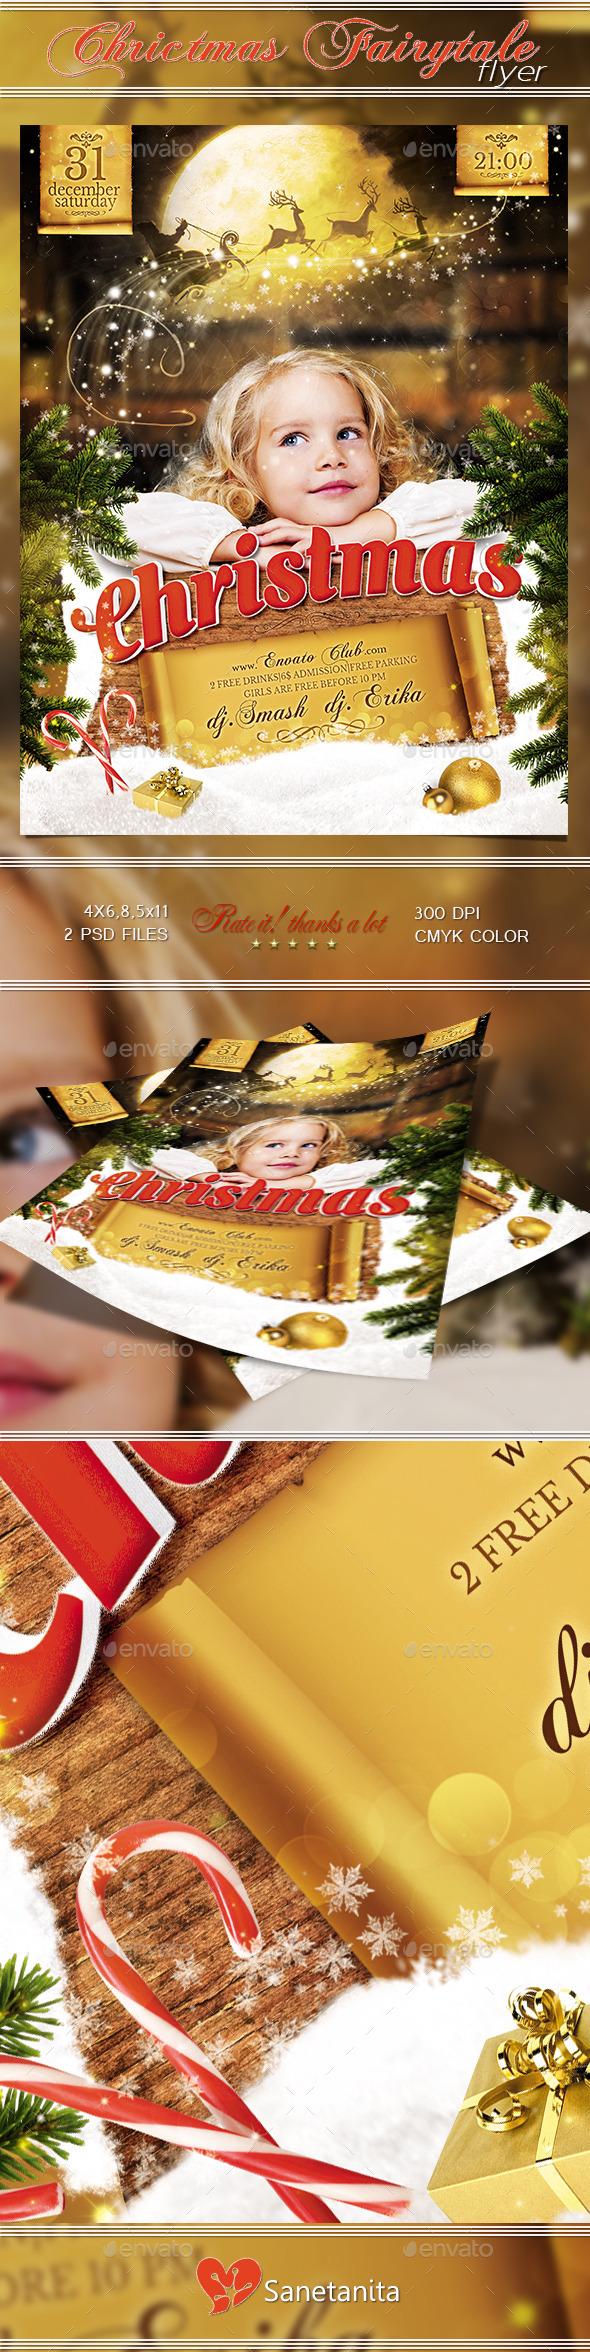 GraphicRiver Christmas Fairytale Flyer 9768289